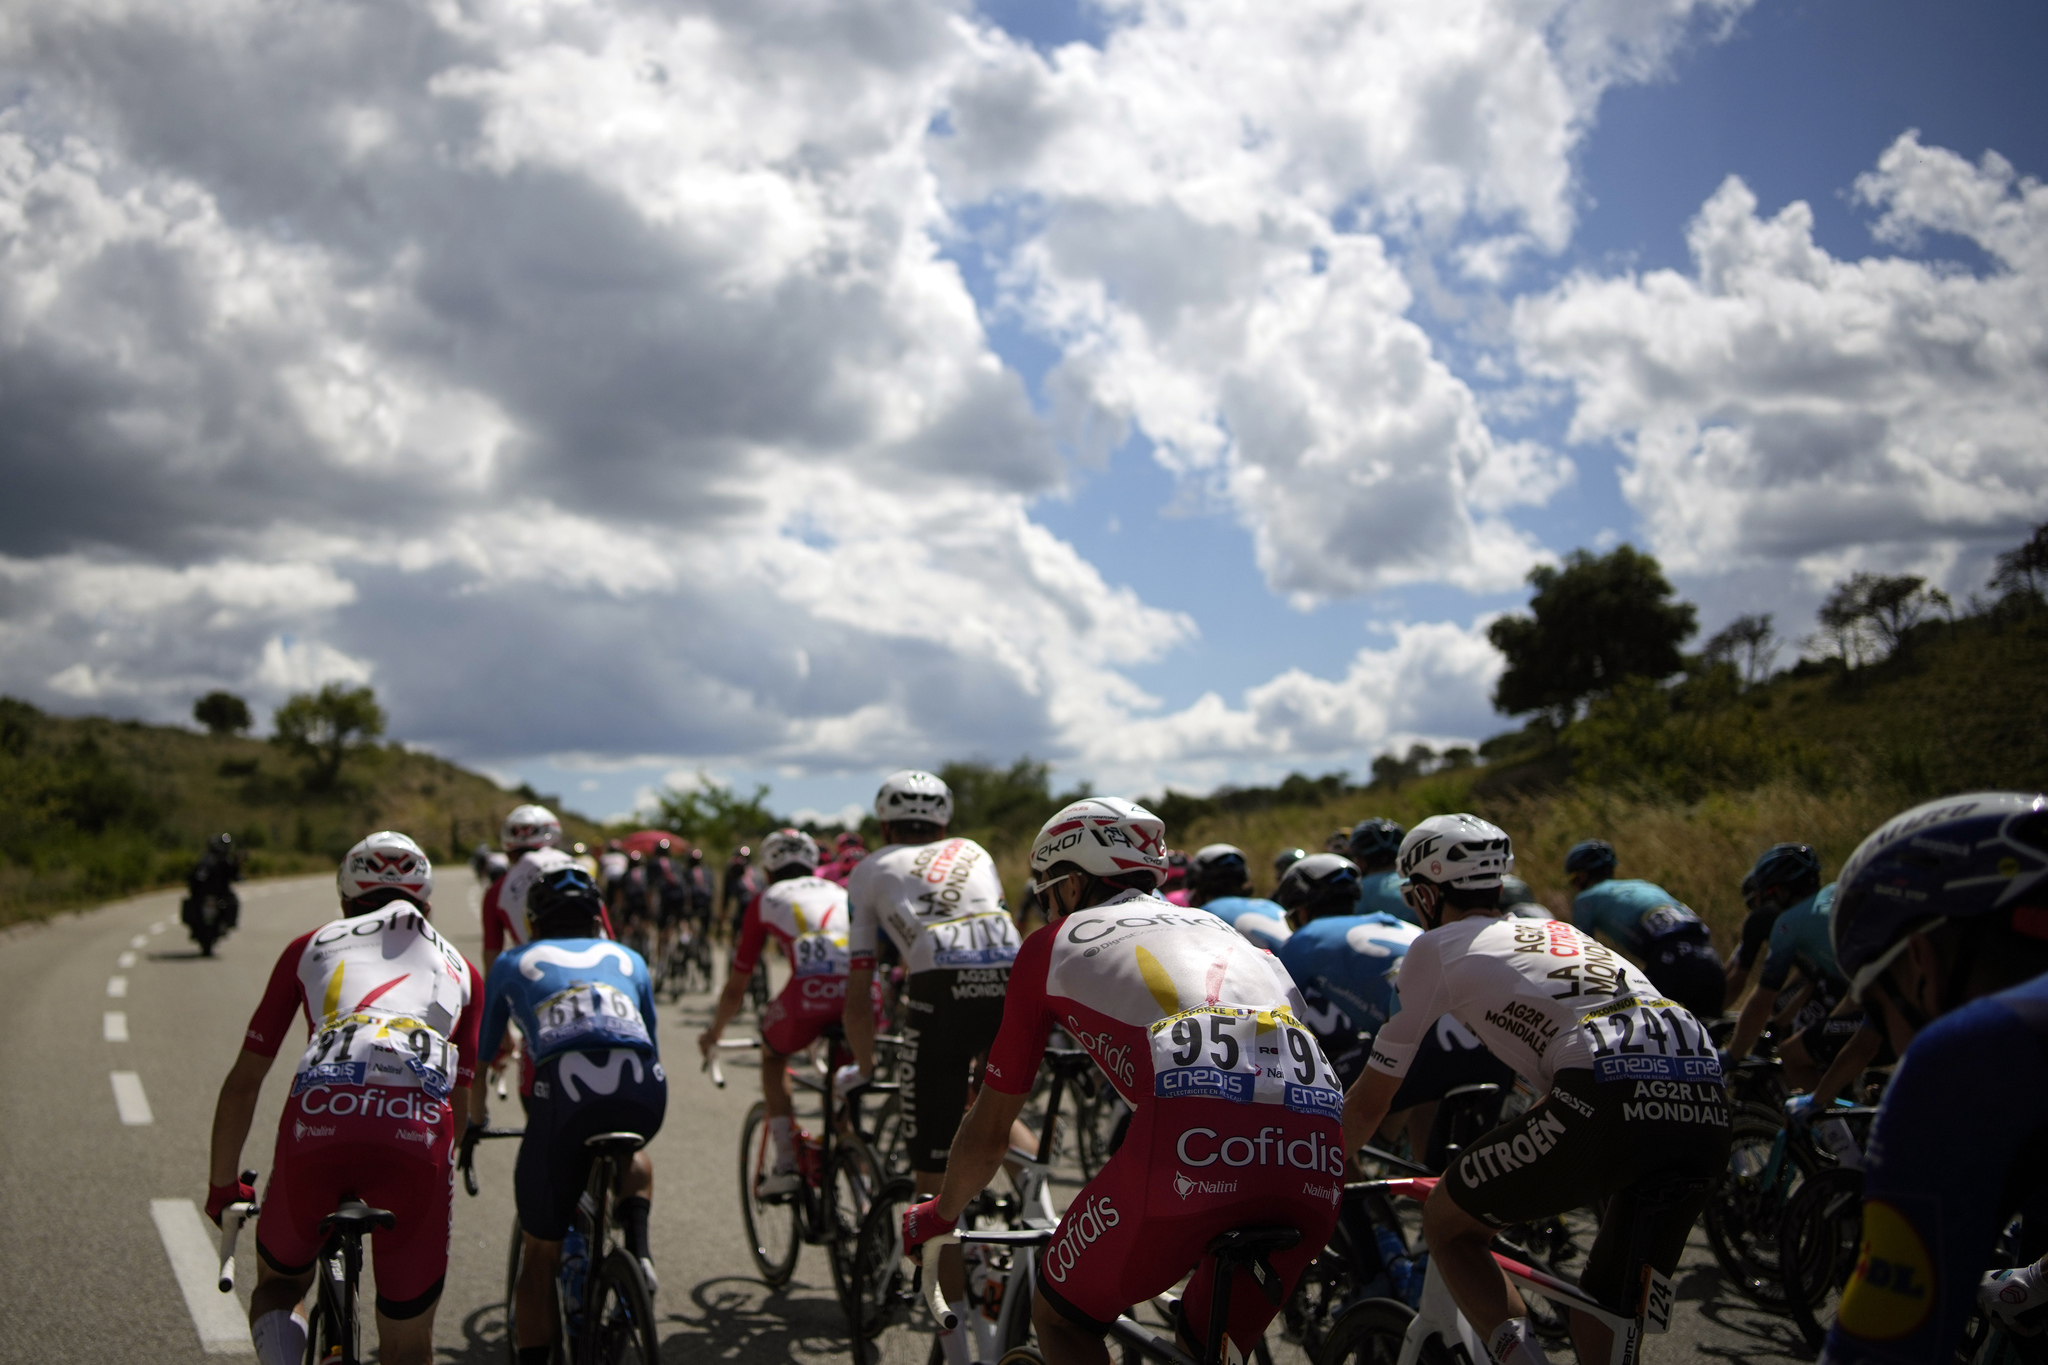 El pelotón rueda durante la 12ª etapa del Tour